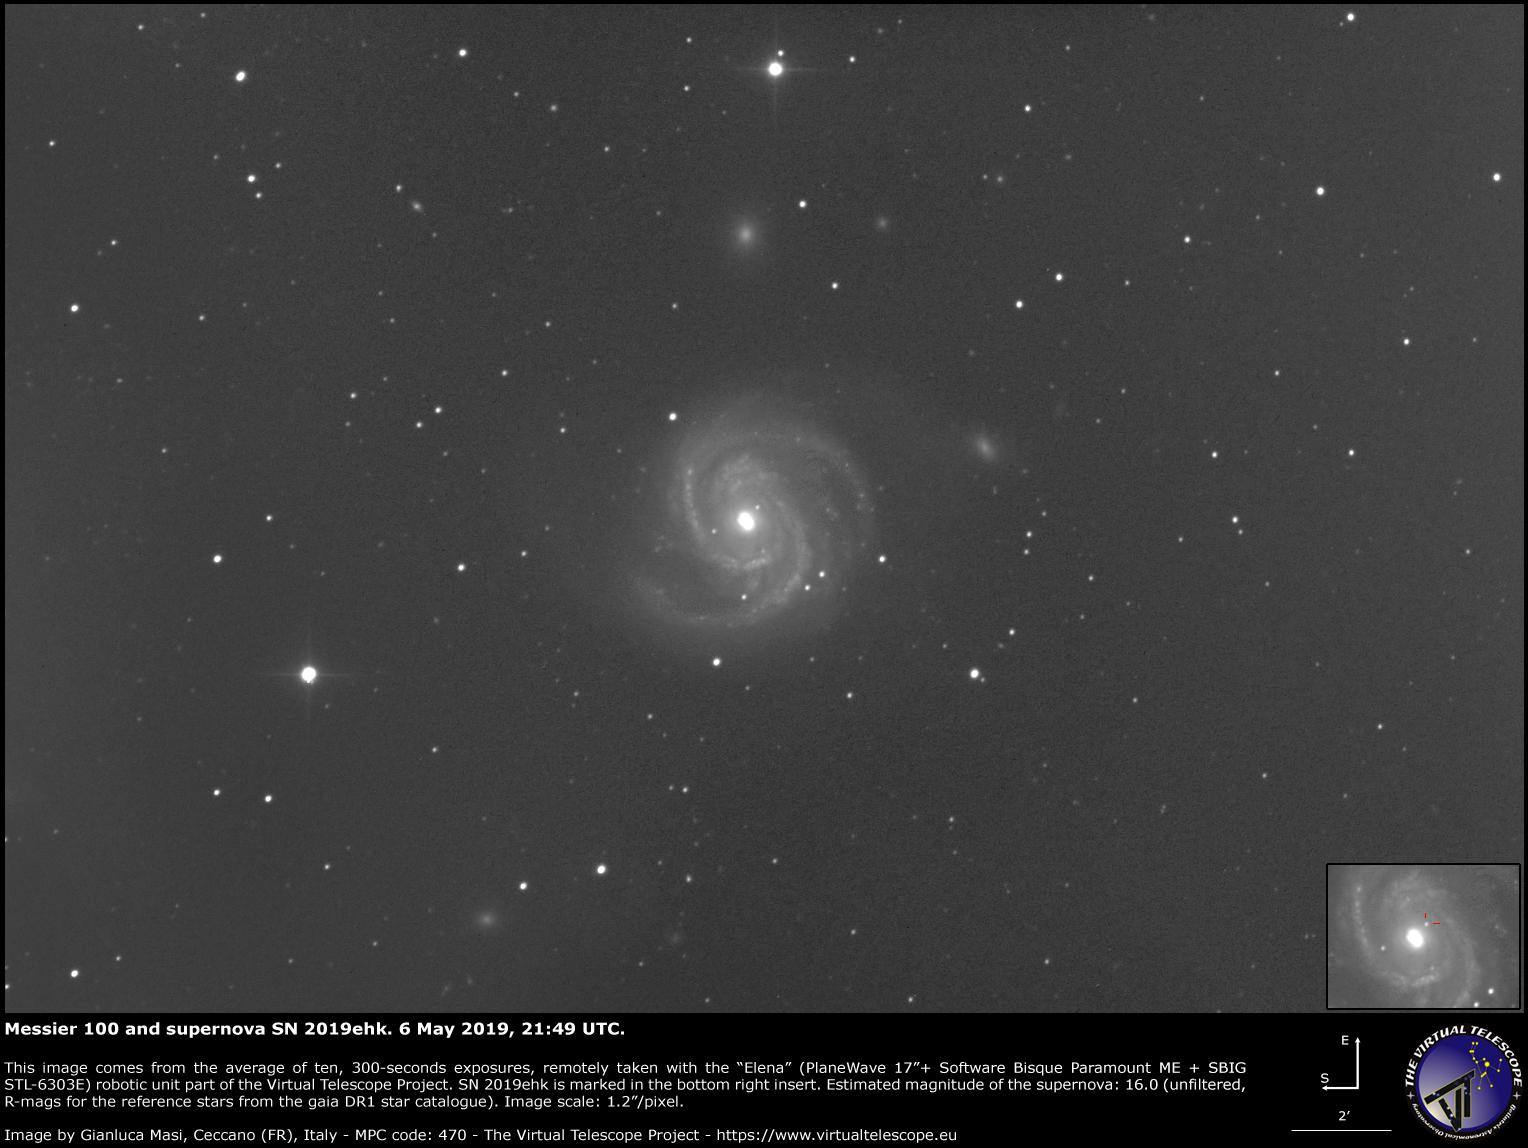 Supernova SN 2019ehk in Messier 100: 6 May 2019